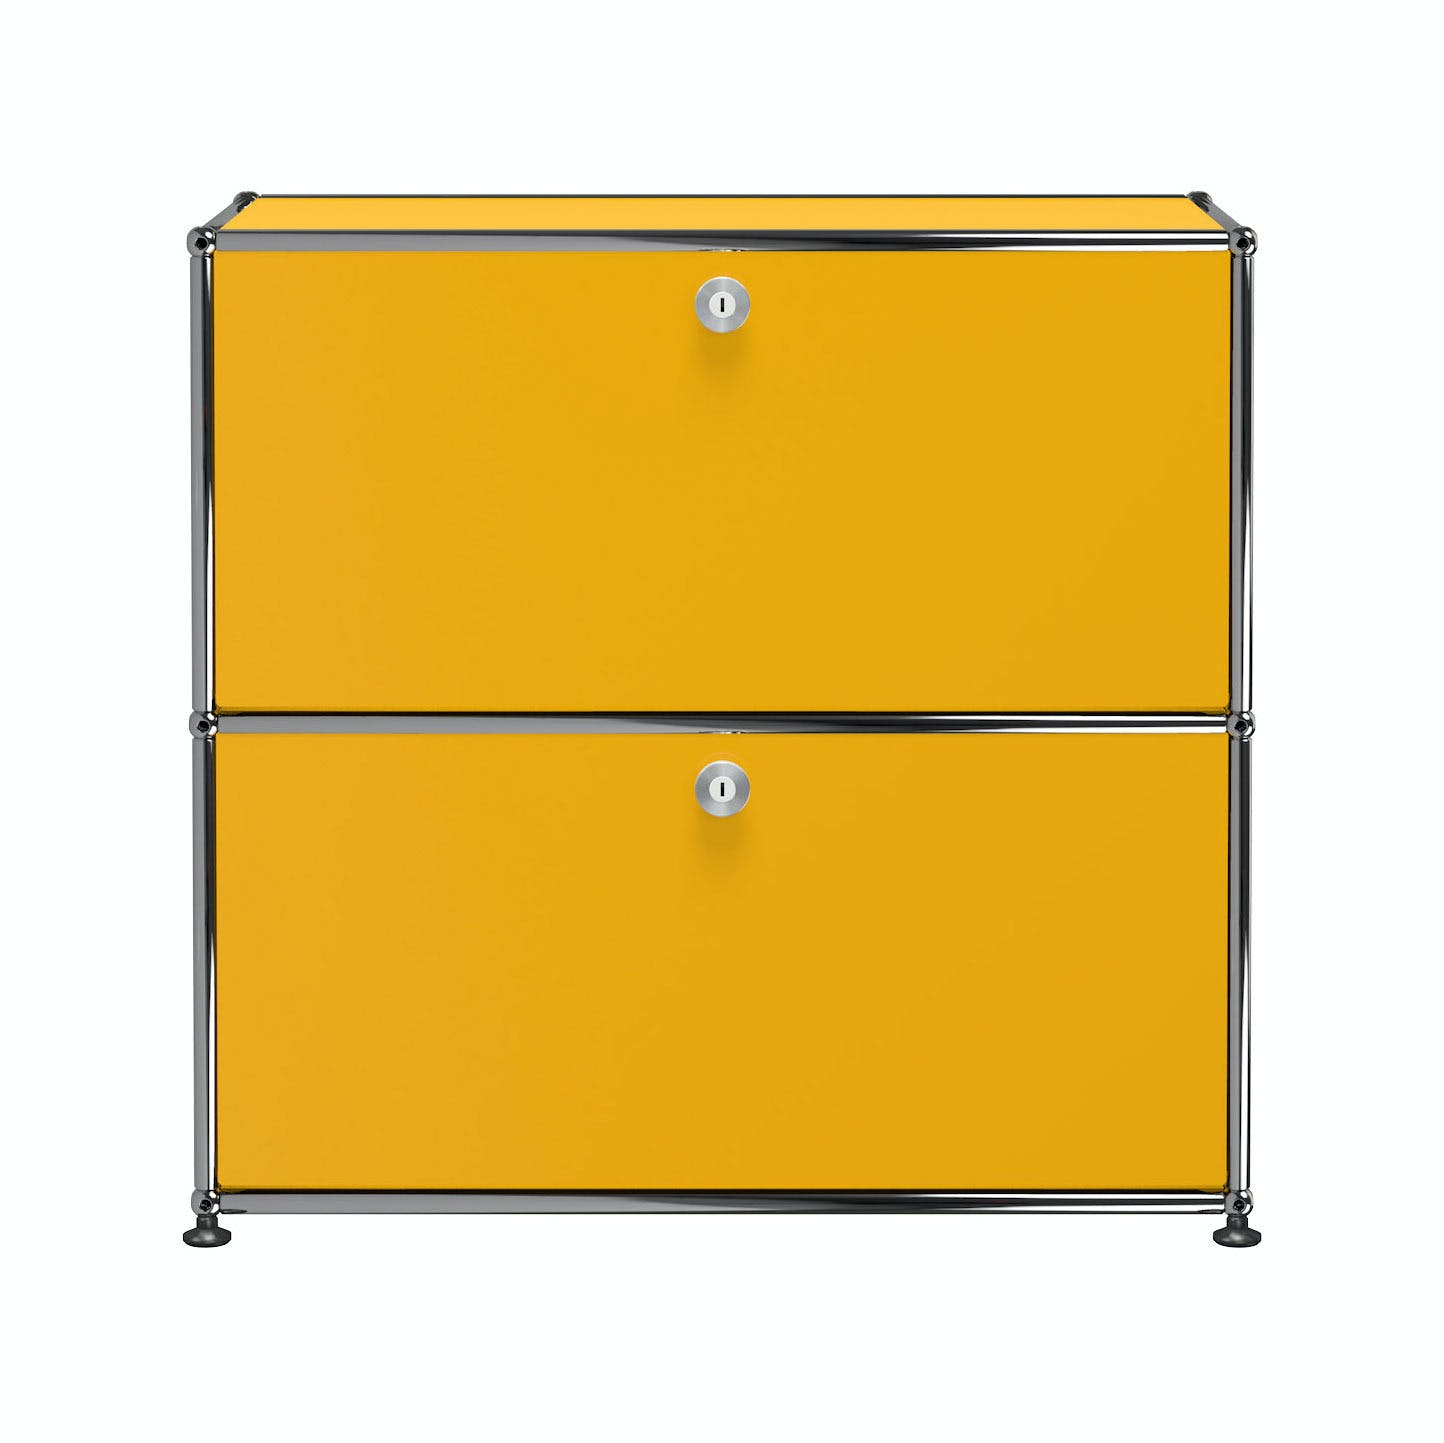 Usm-quick-ship-white-Haller-Storage-C1A18-yellow-haute-living